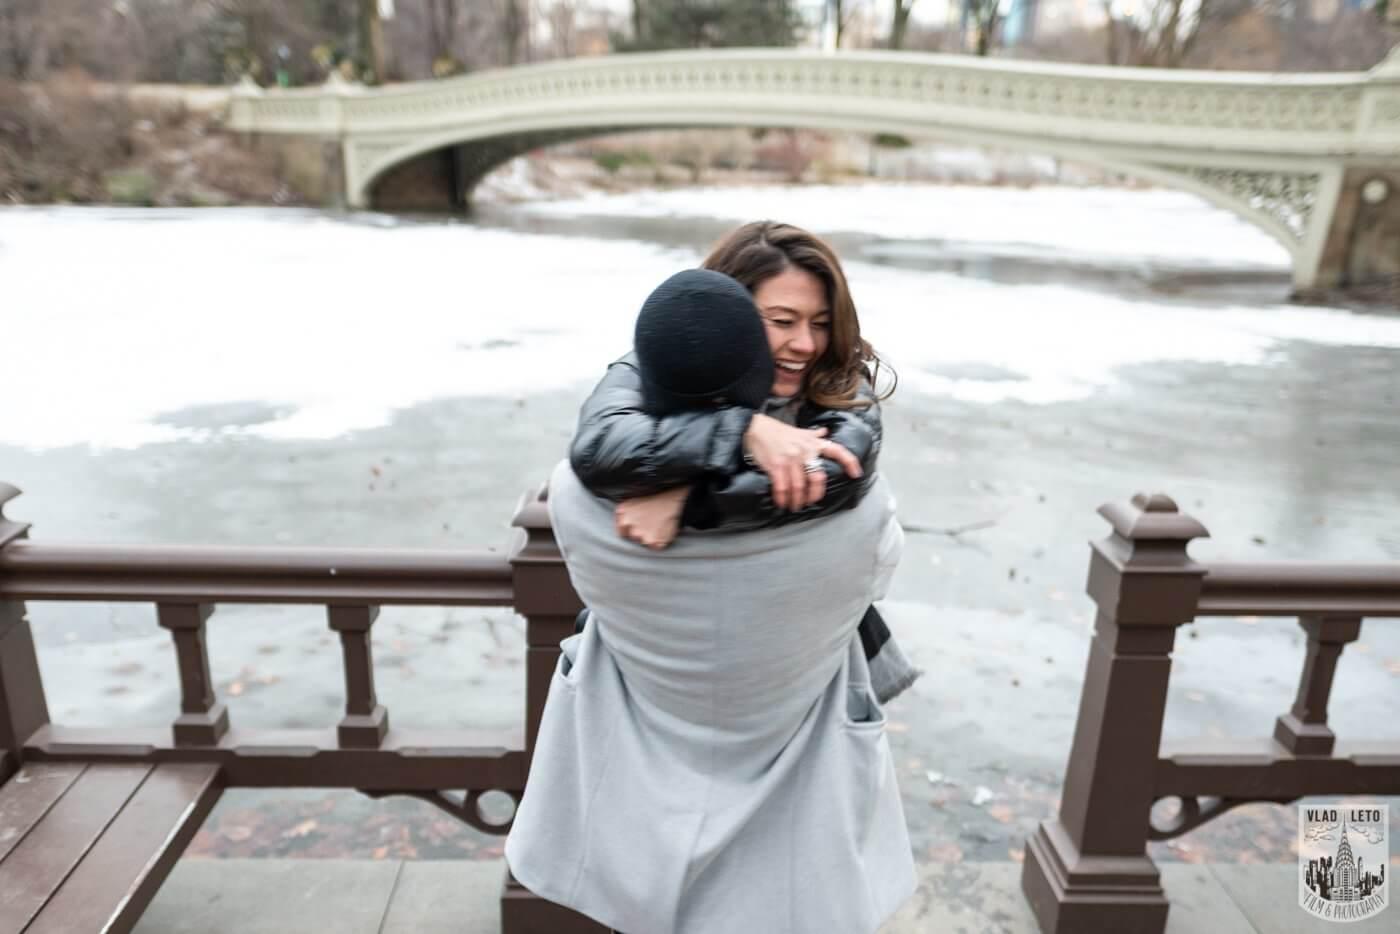 Photo 3 Bow bridge surprise marriage proposal.   VladLeto